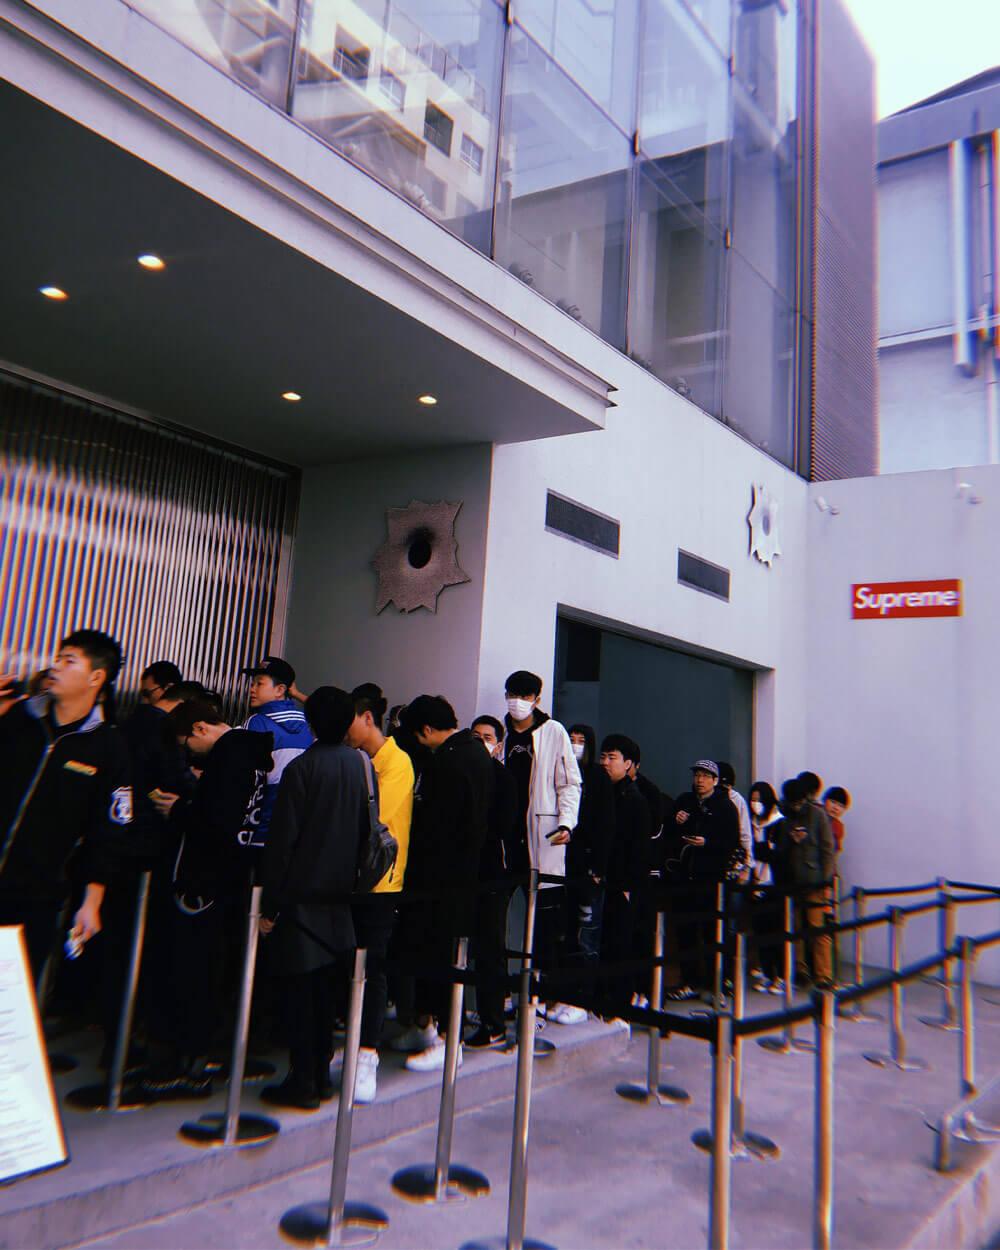 Why-Is-Supreme-So-Expensive-Line-at-Supreme-Shibuya